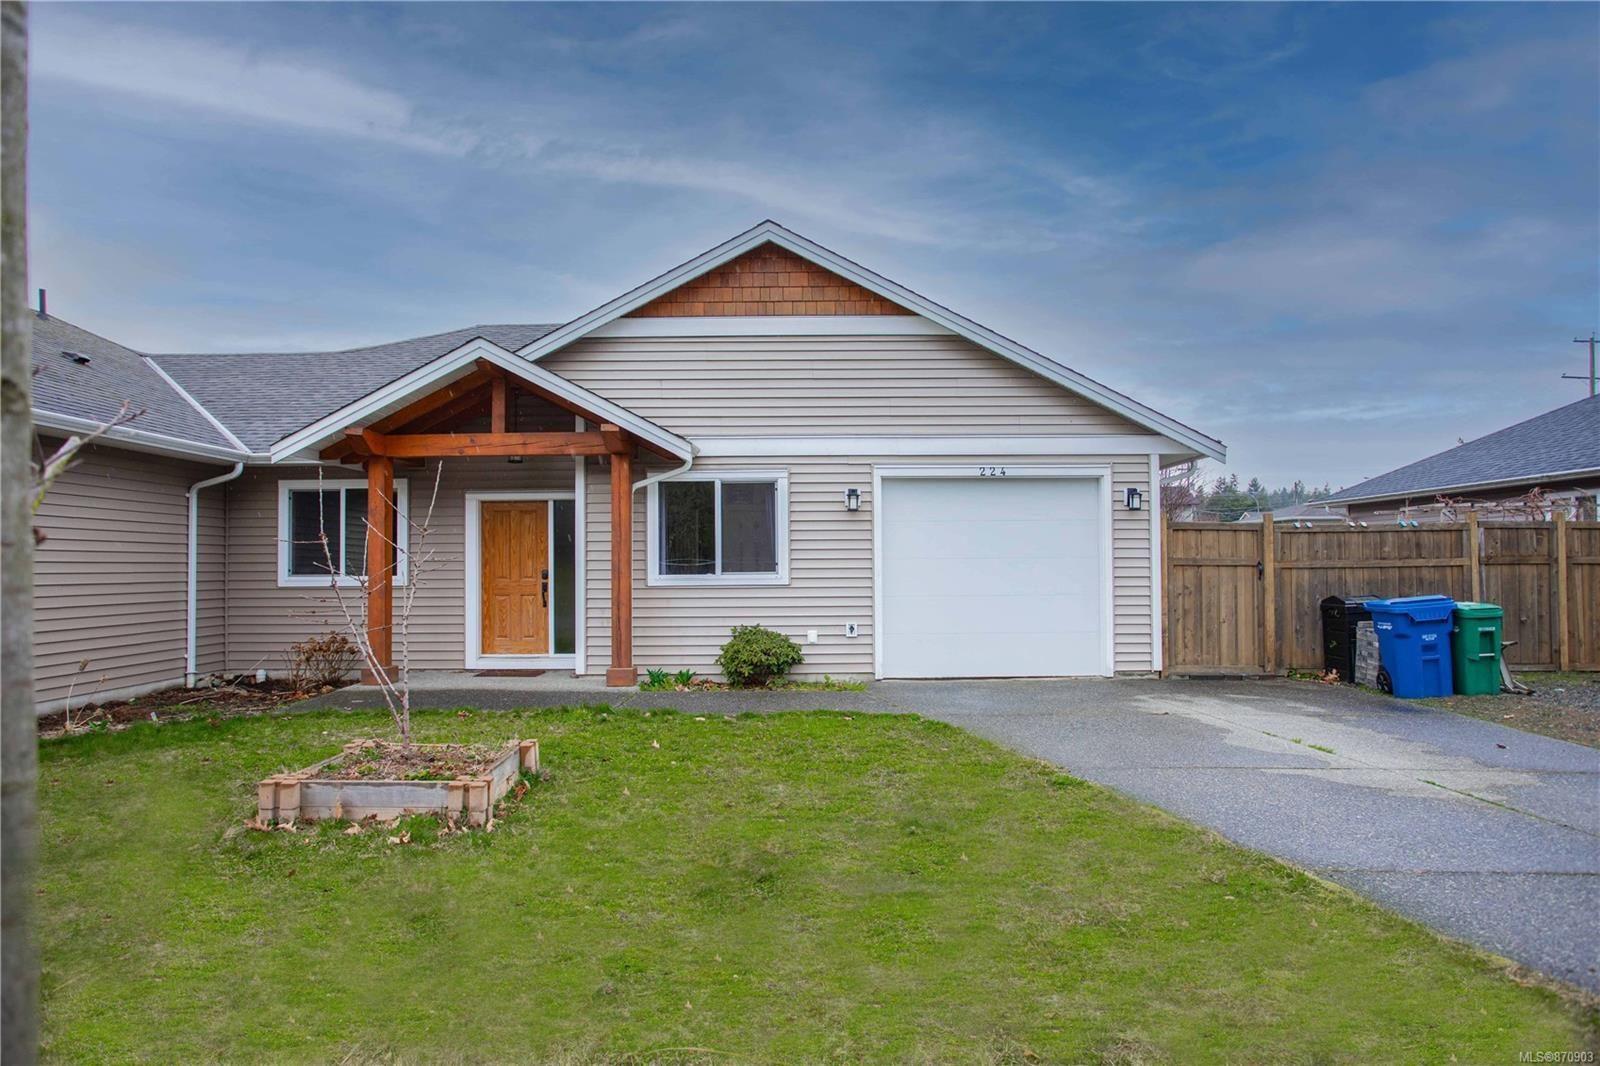 Main Photo: 224 Silver Valley Rd in : Na Central Nanaimo Half Duplex for sale (Nanaimo)  : MLS®# 870903